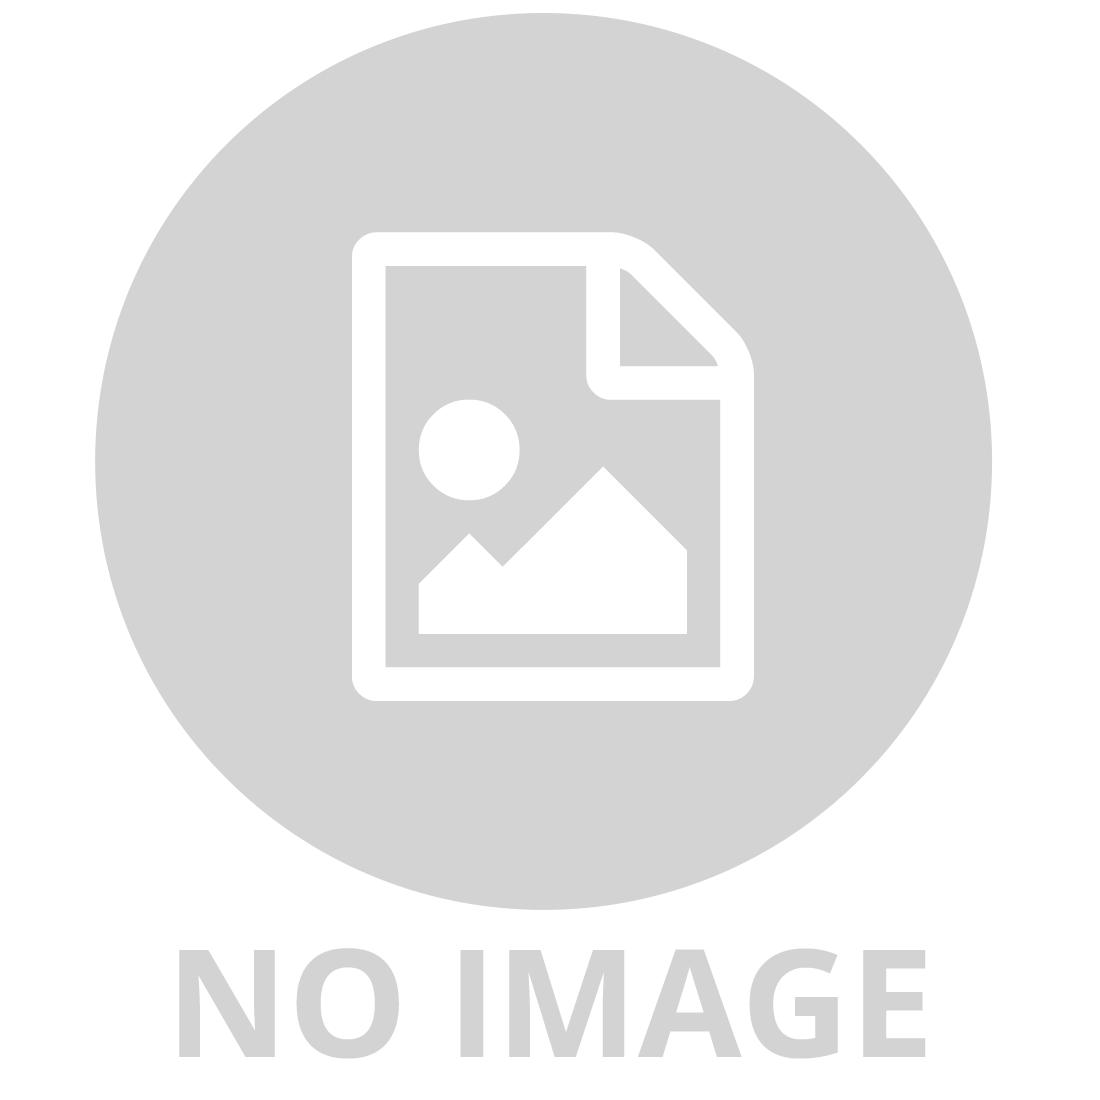 BEANIE BOOS- REGULAR TWIGGY PINK OWL